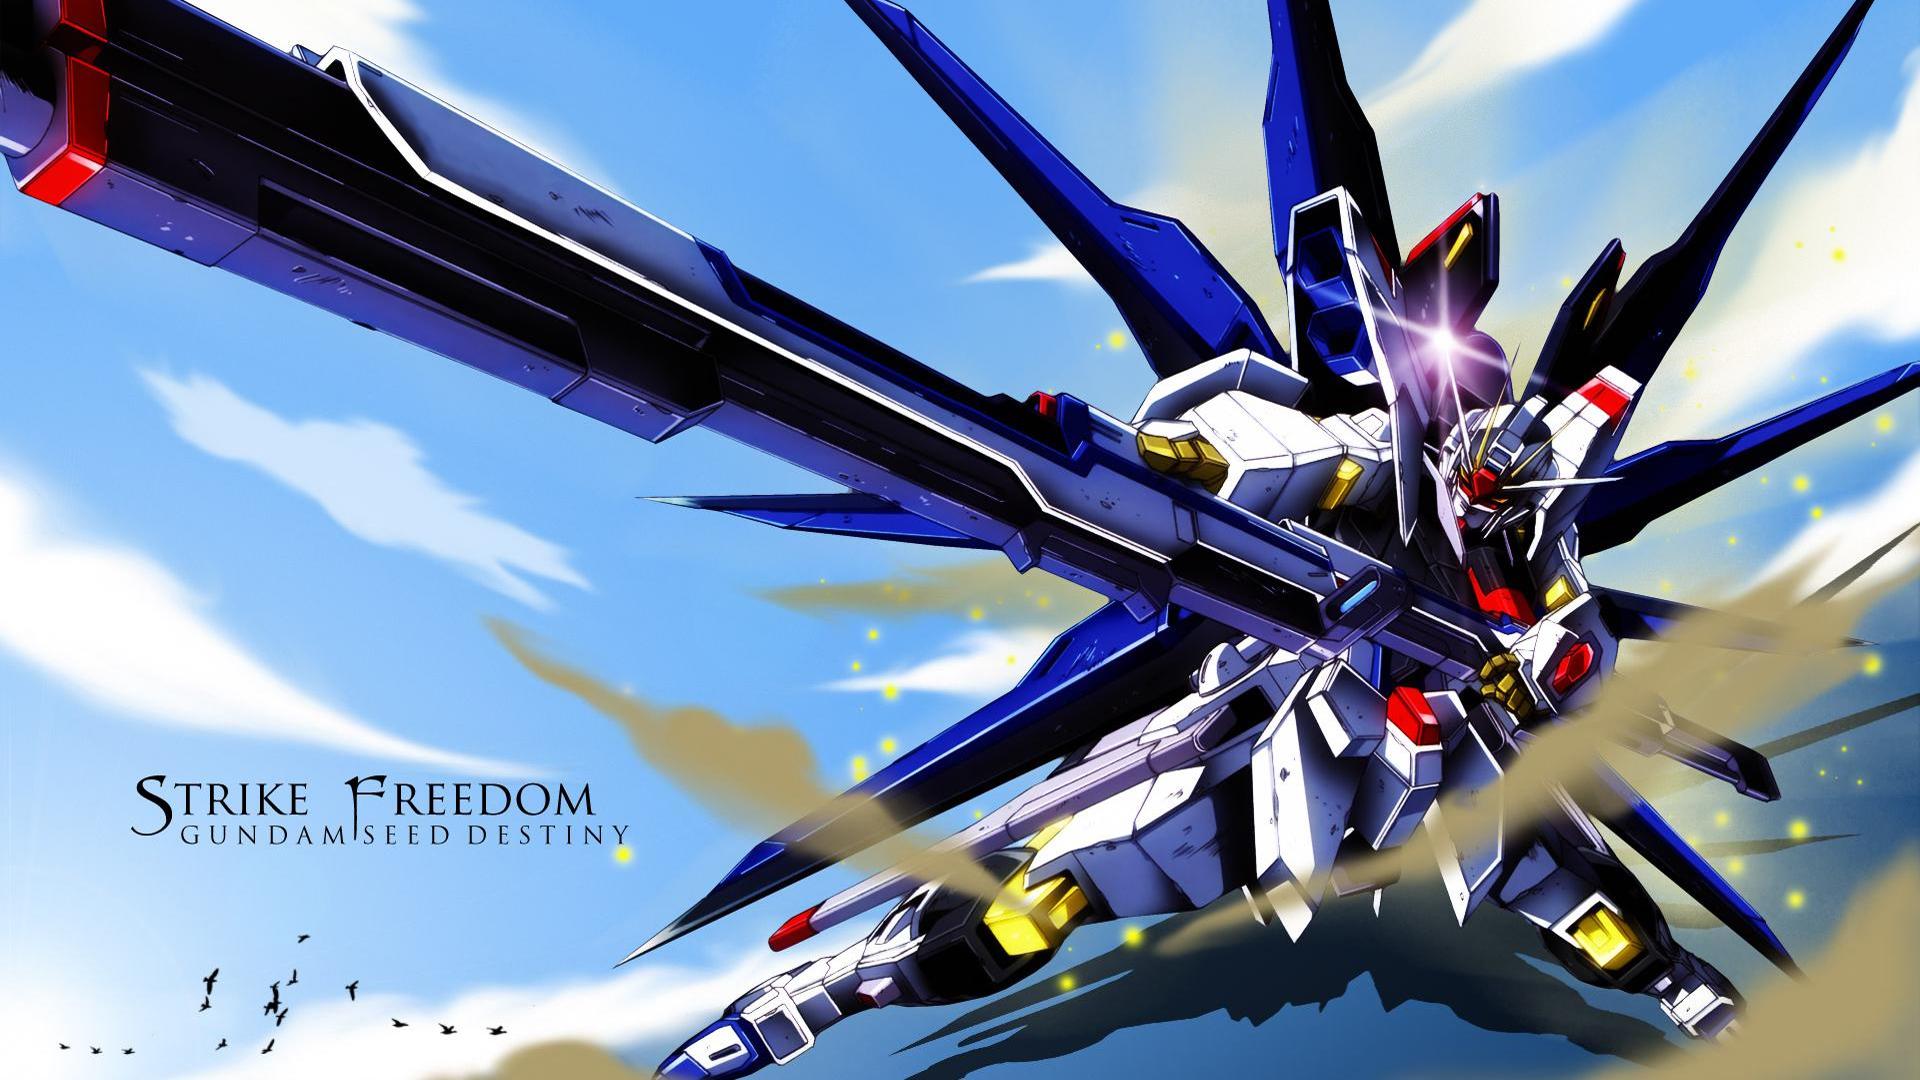 Destiny Wallpapers Gundam Seed Destiny Myspace Backgrounds Gundam 1920x1080